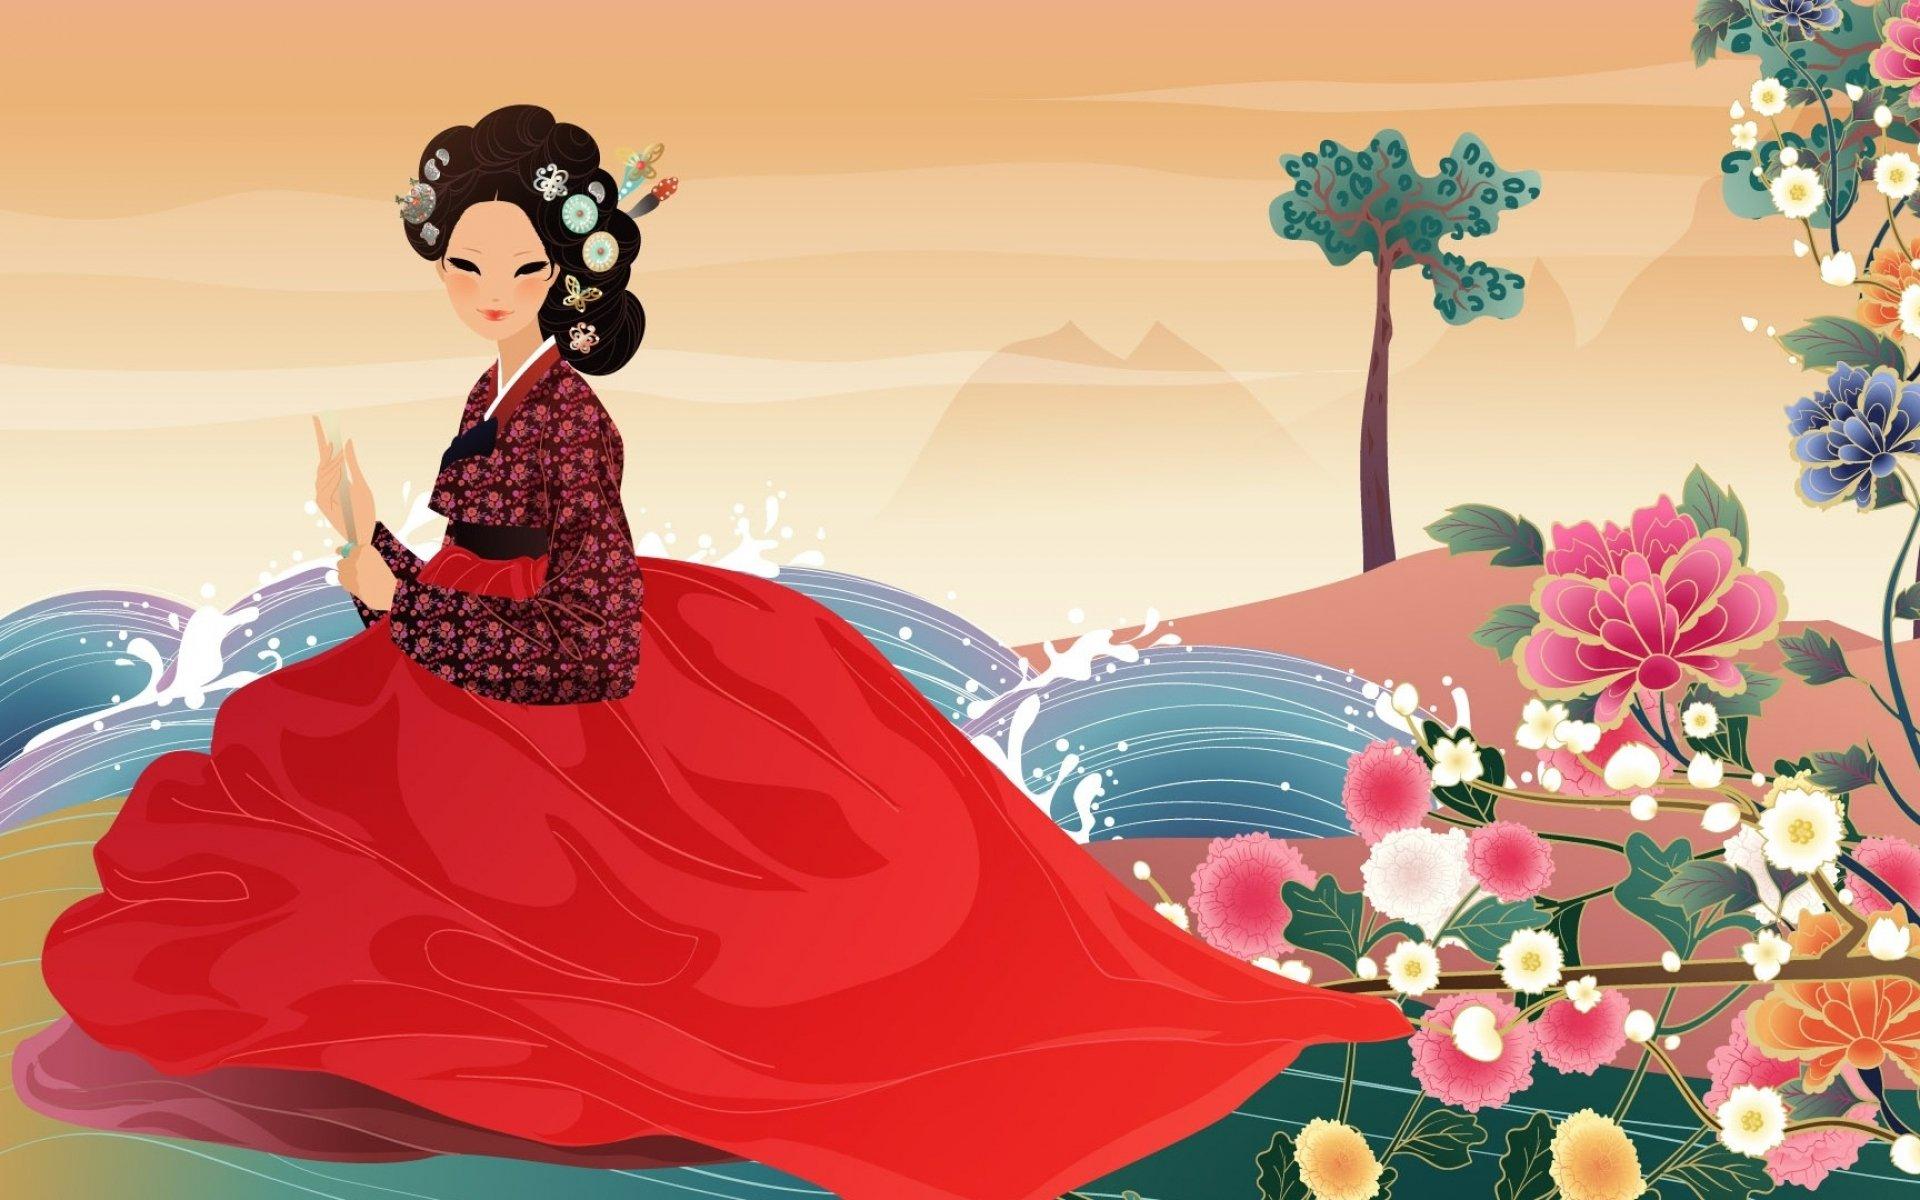 Living room <font><b>home</b></font> wall <font><b>decoration</b></font> fabric poster artistic art artwork women female girls girl woman <font><b>asian</b></font> korean oriental river